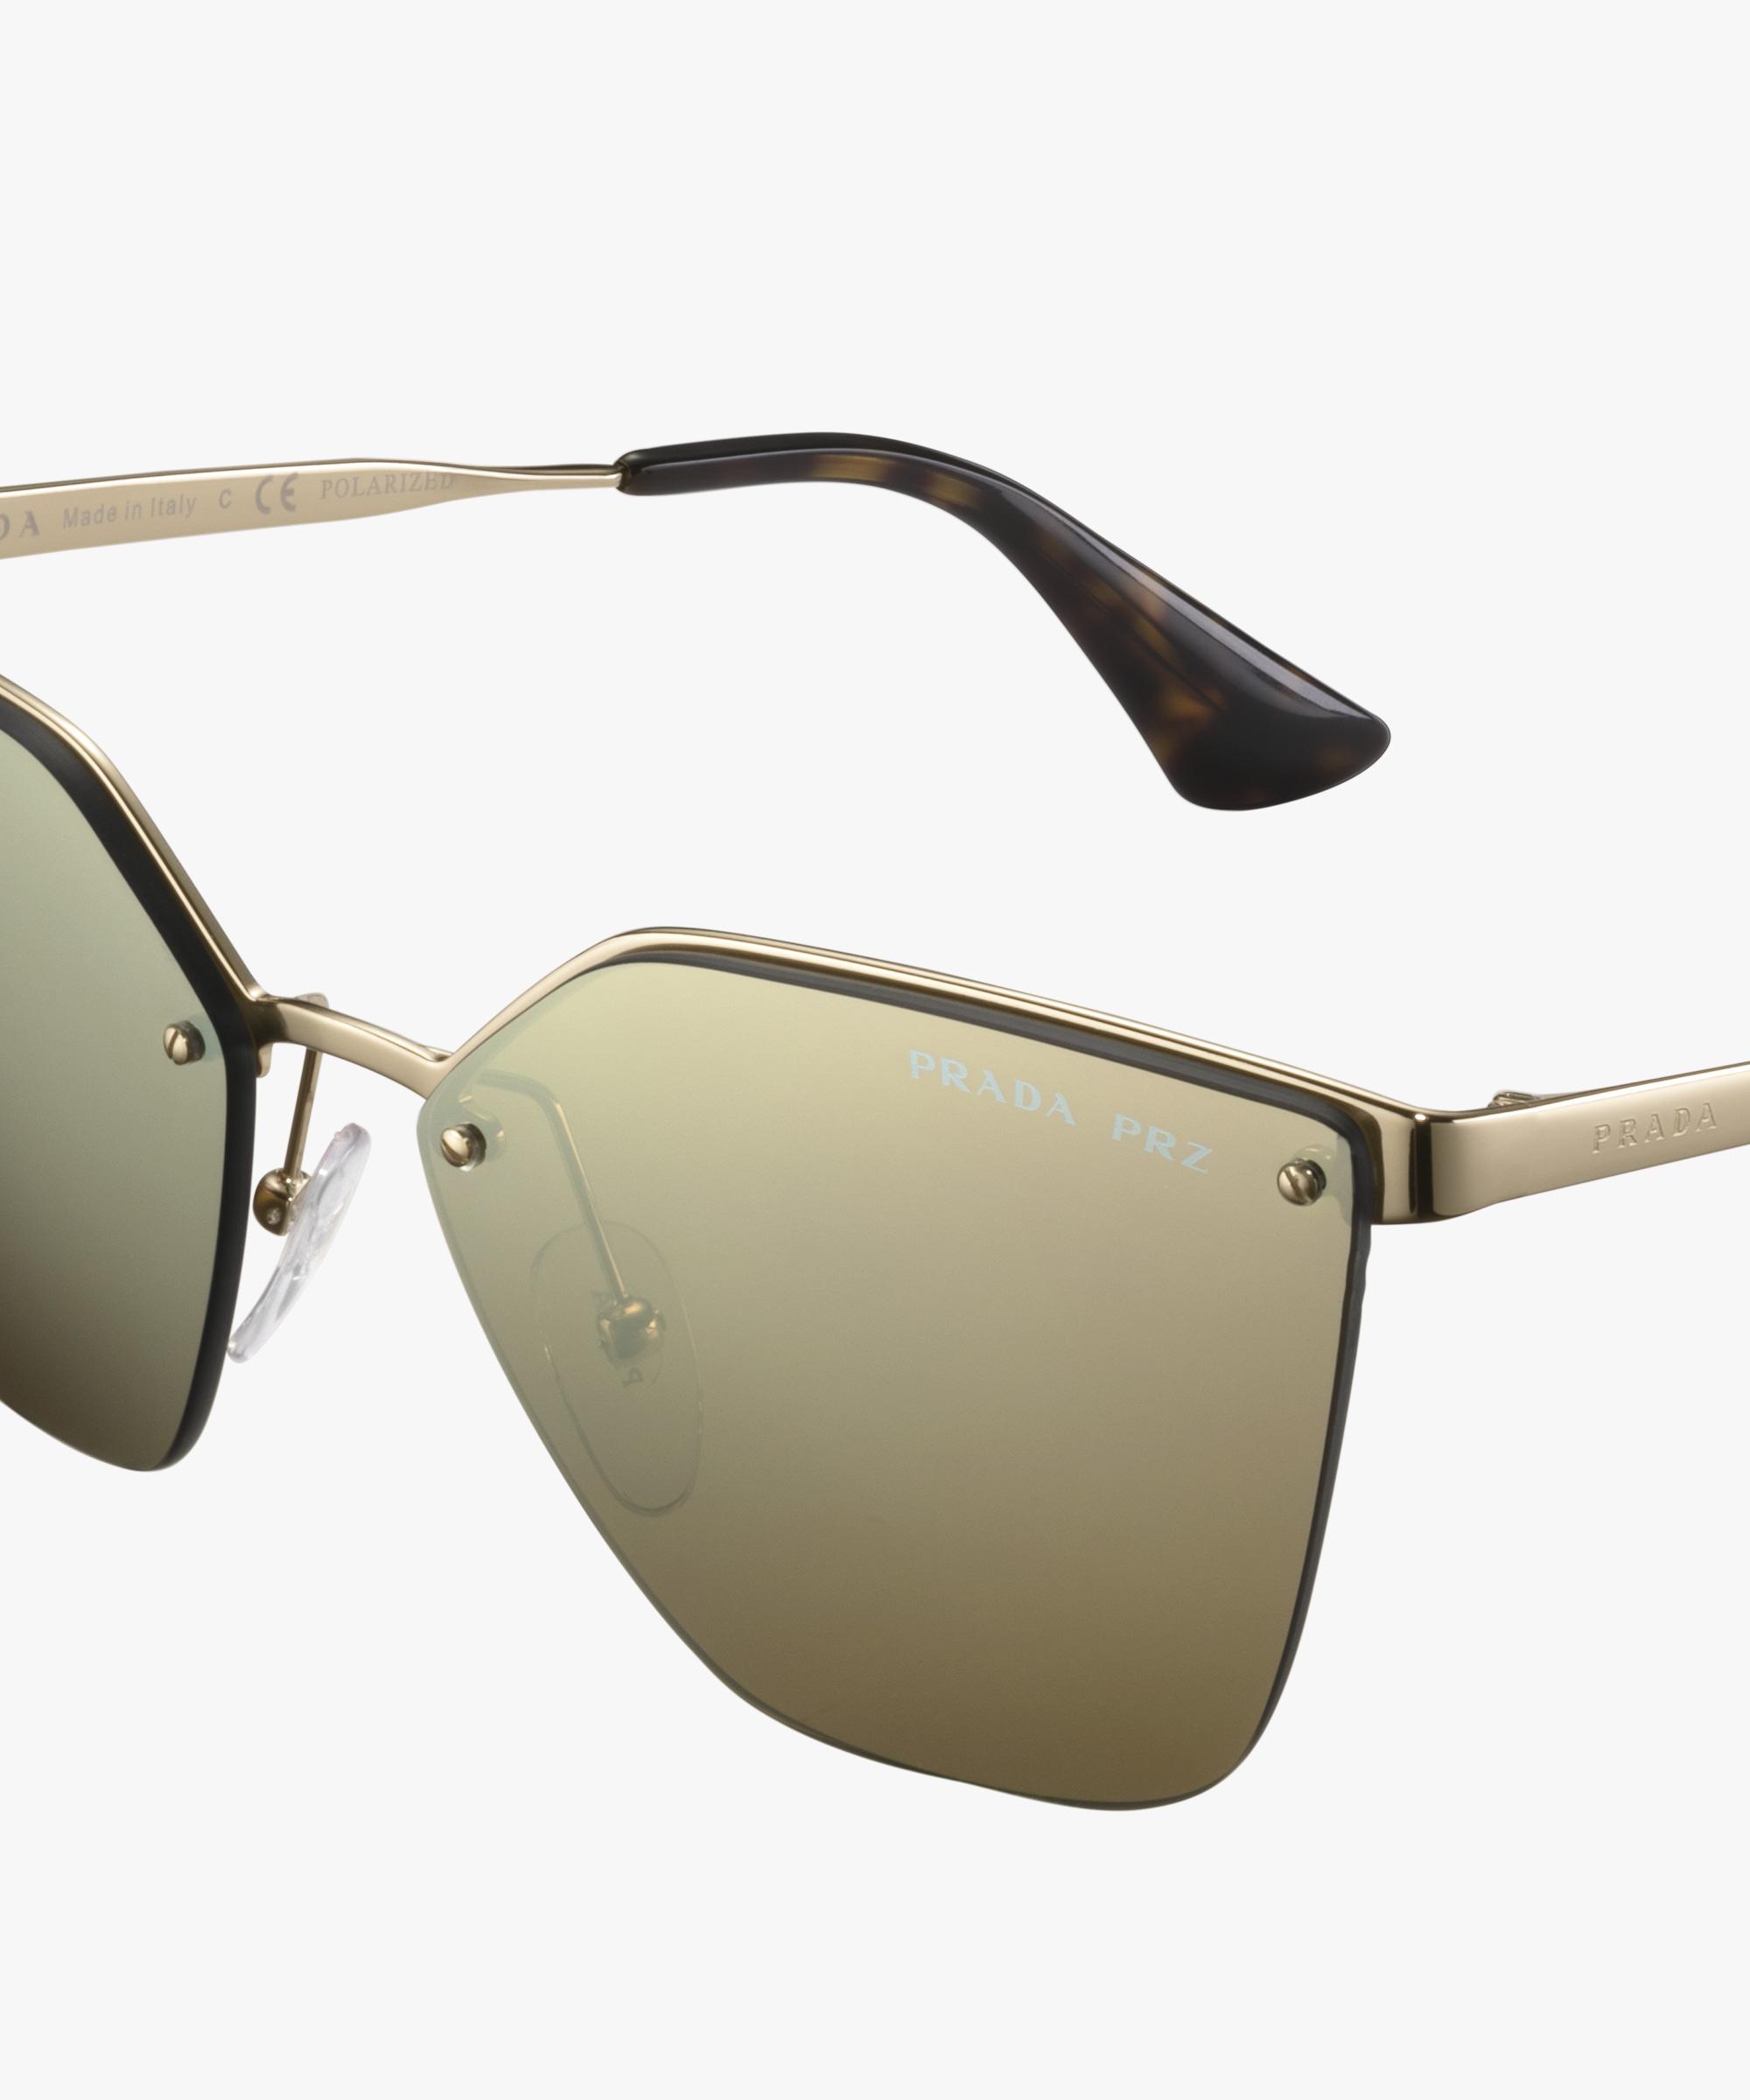 901a6fa3ed Prada Cinéma Eyewear Prada POLARIZED MIRRORED BROWN LENSES ...